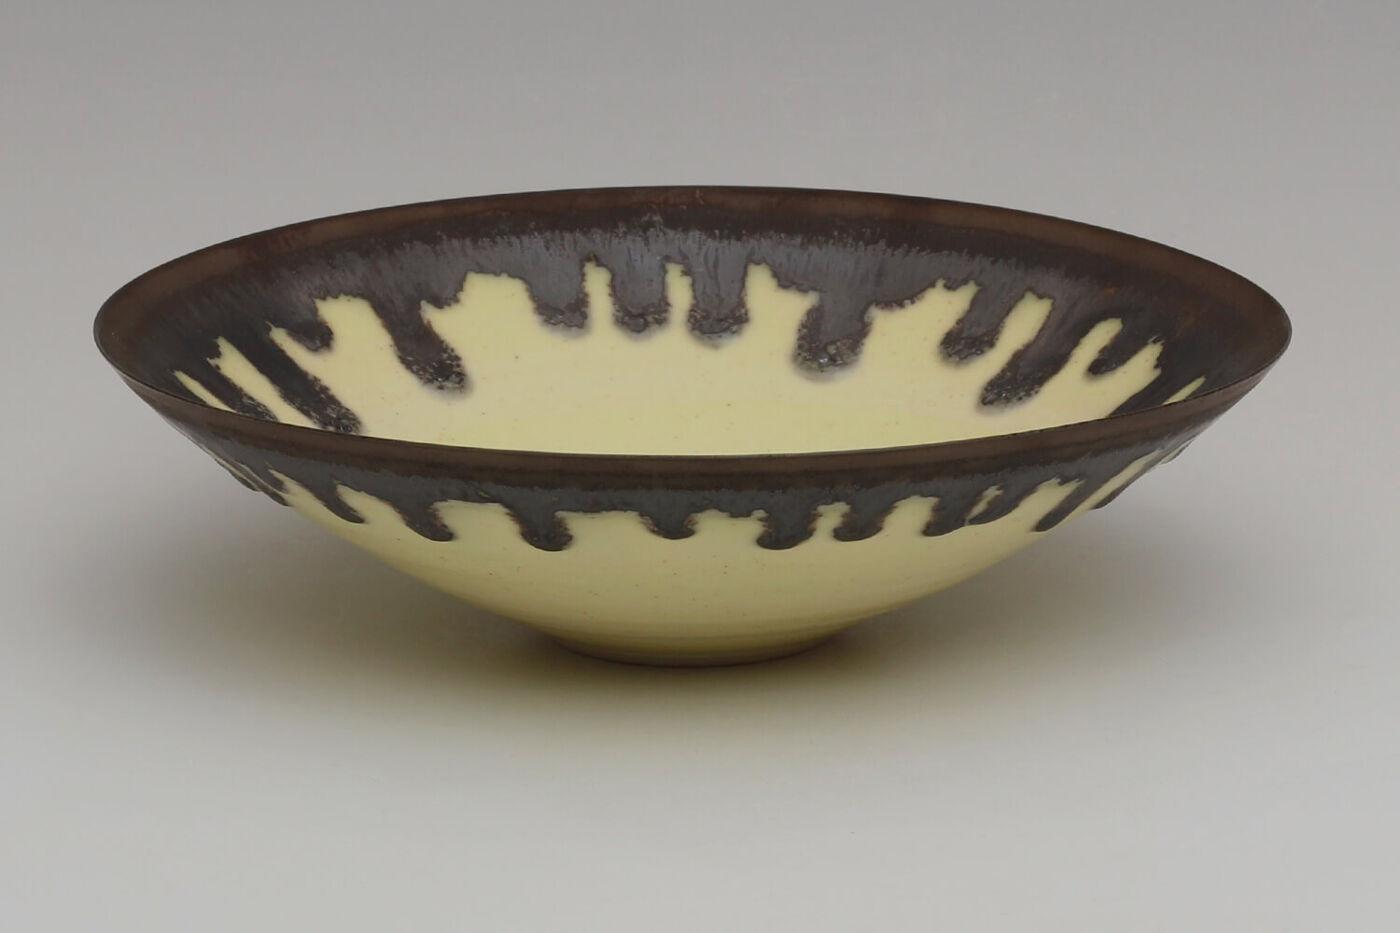 Peter Wills Ceramic Pale Flecked Yellow Porcelain Bowl 202